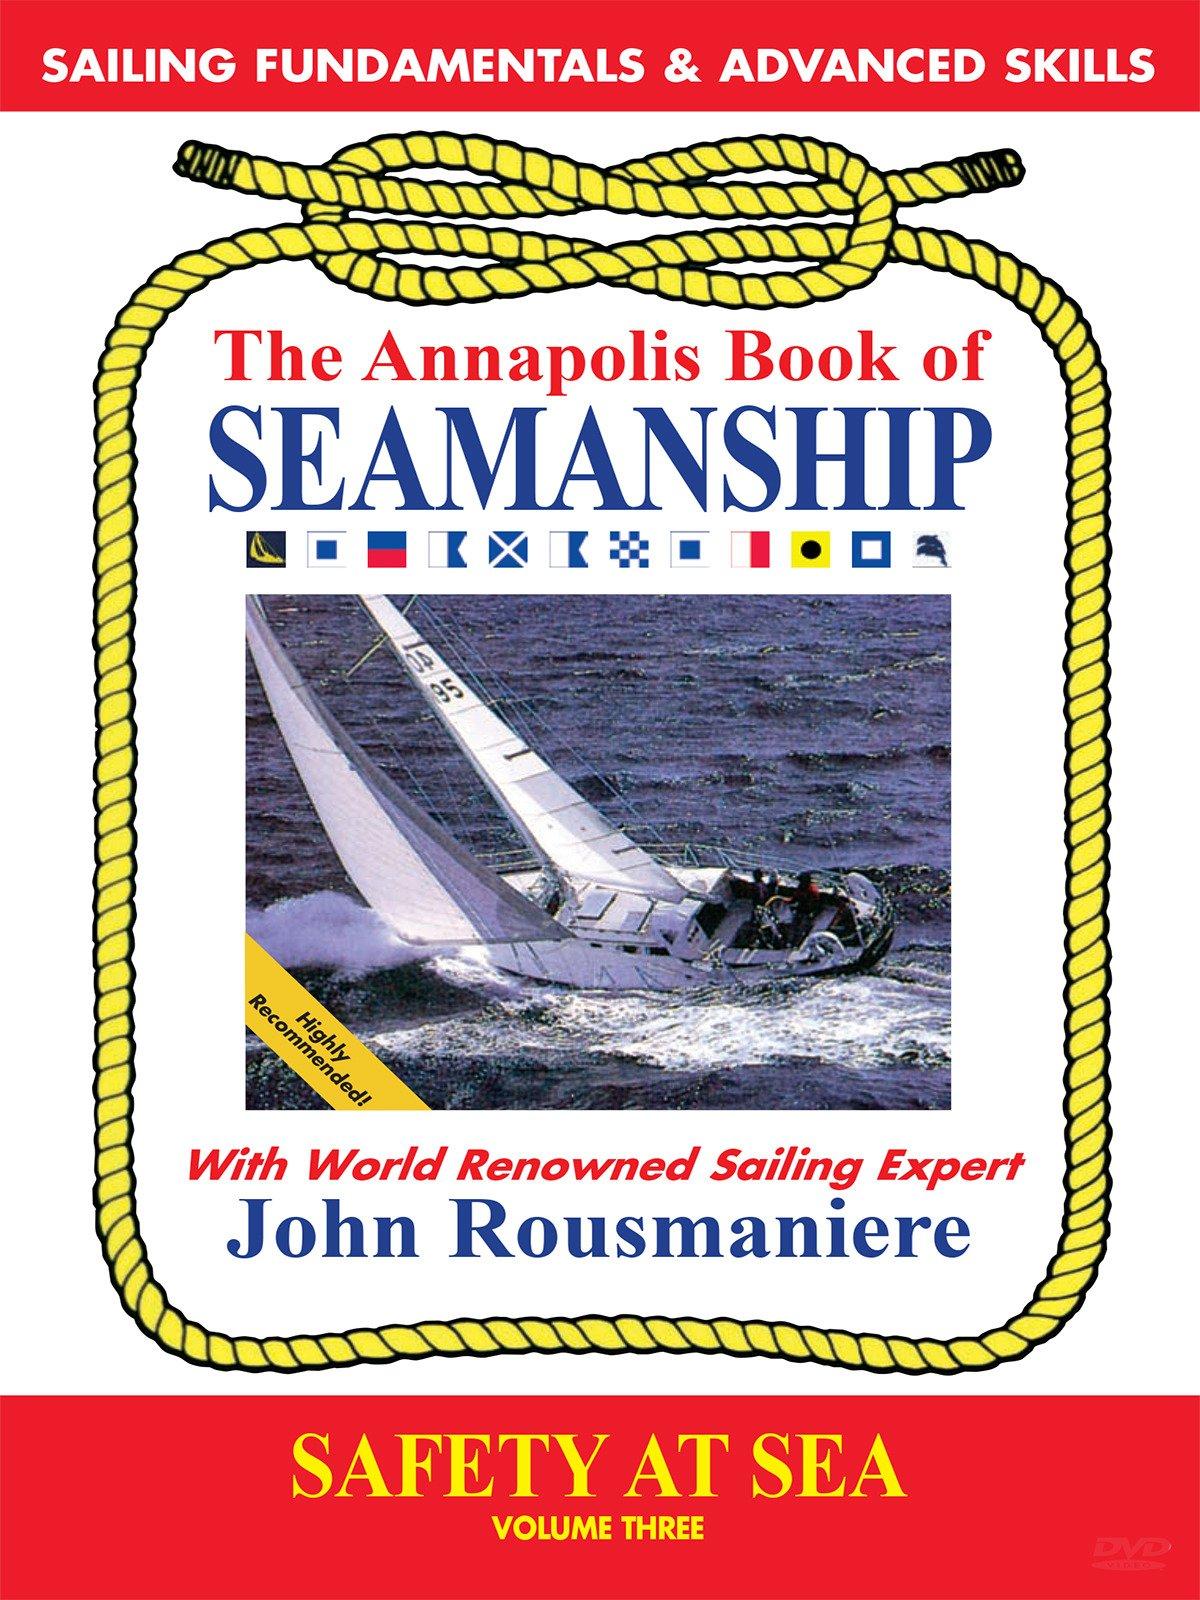 The Annapolis Book of Seamanship Sailing Fundamentals & Advanced Skills